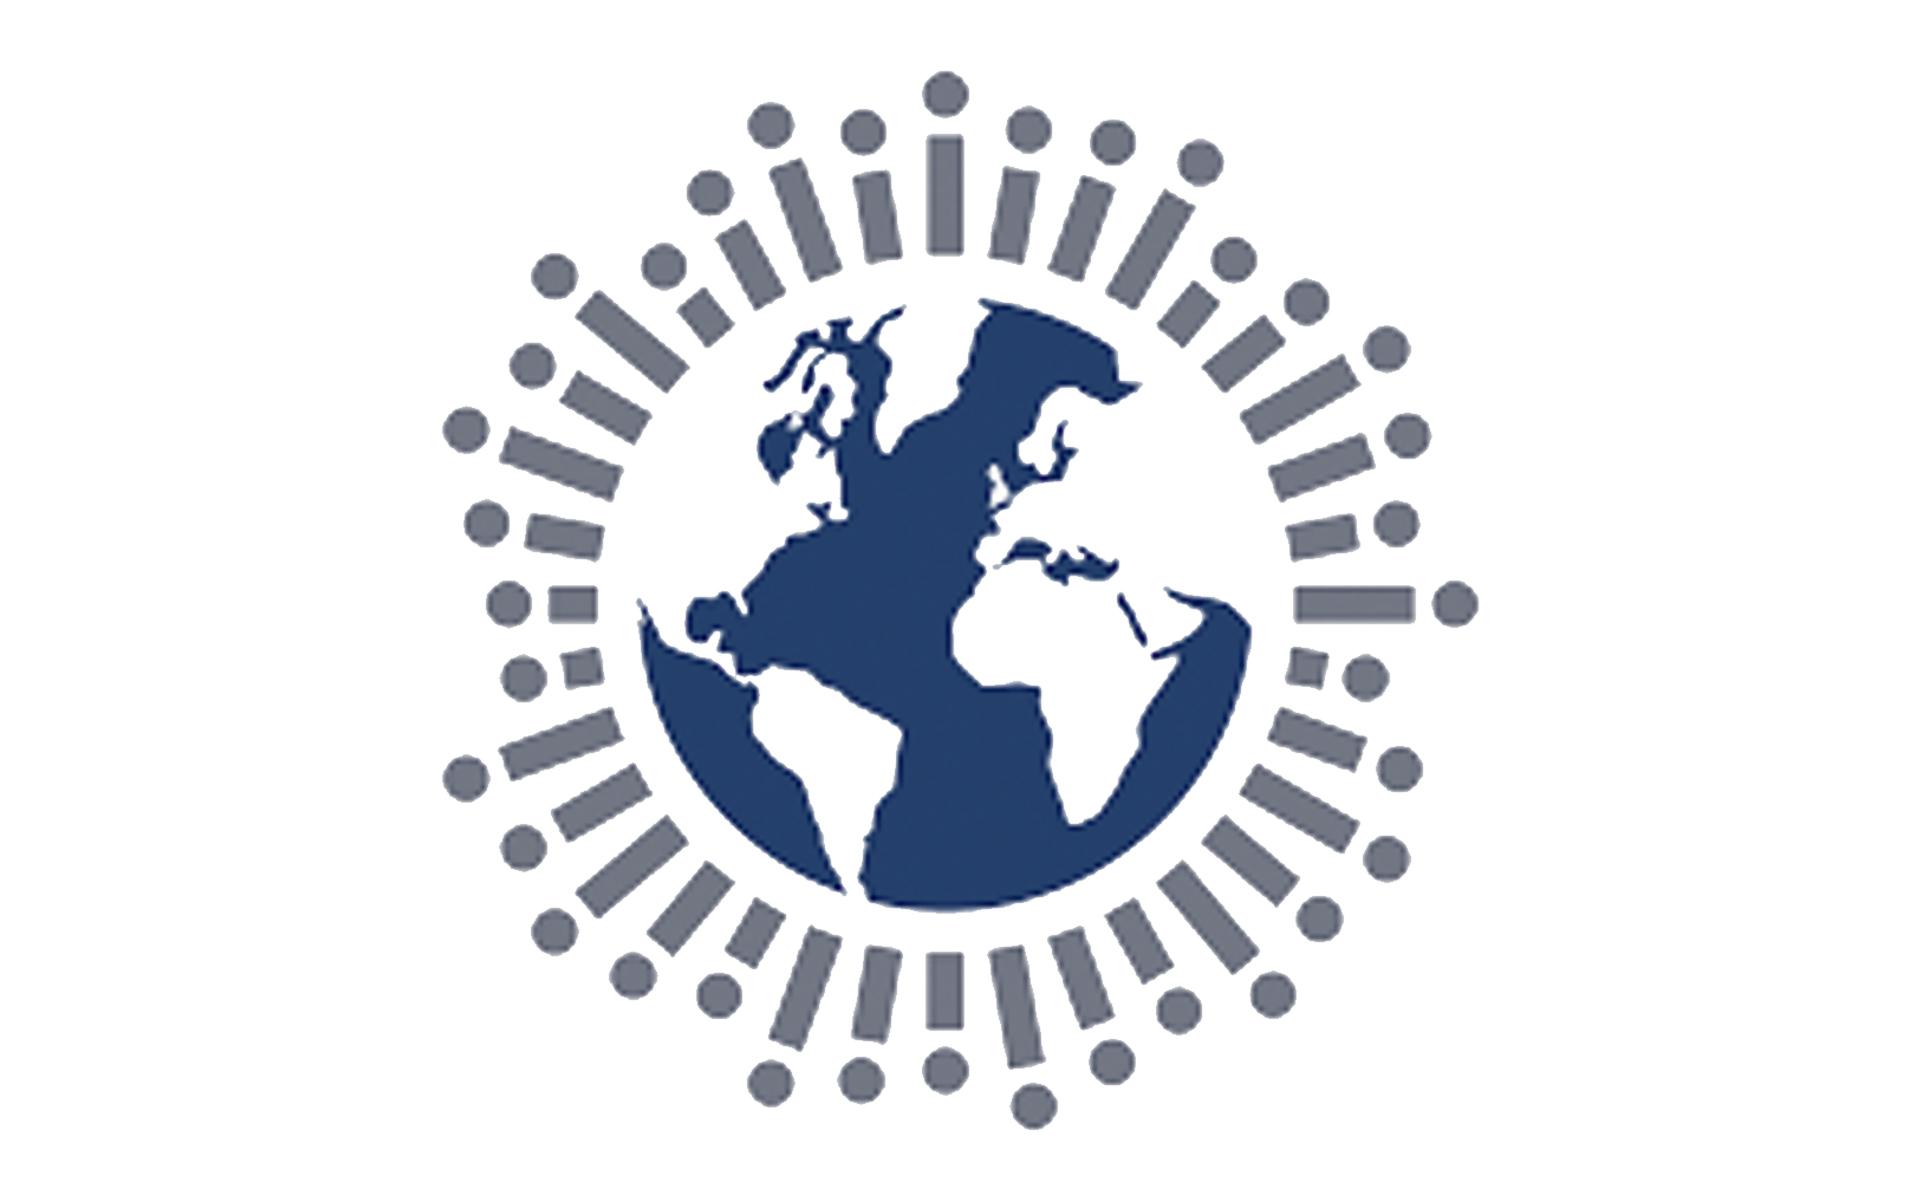 Программа United People Global (UPG) в области устойчивого развития